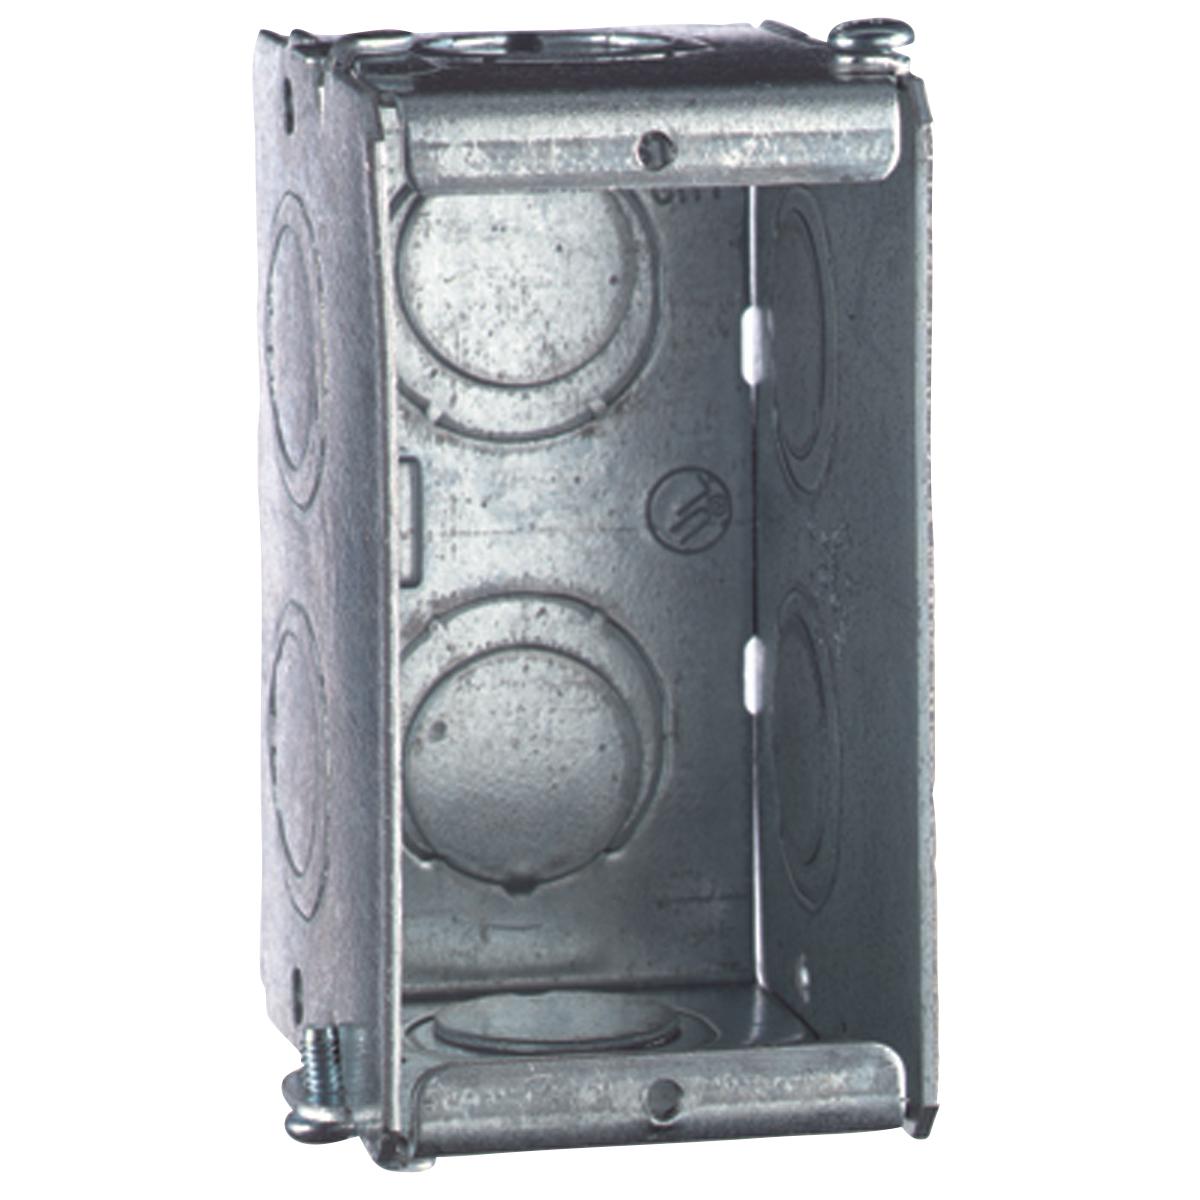 STL-CTY GW125-G 2-1/2D 1G MASON BOX